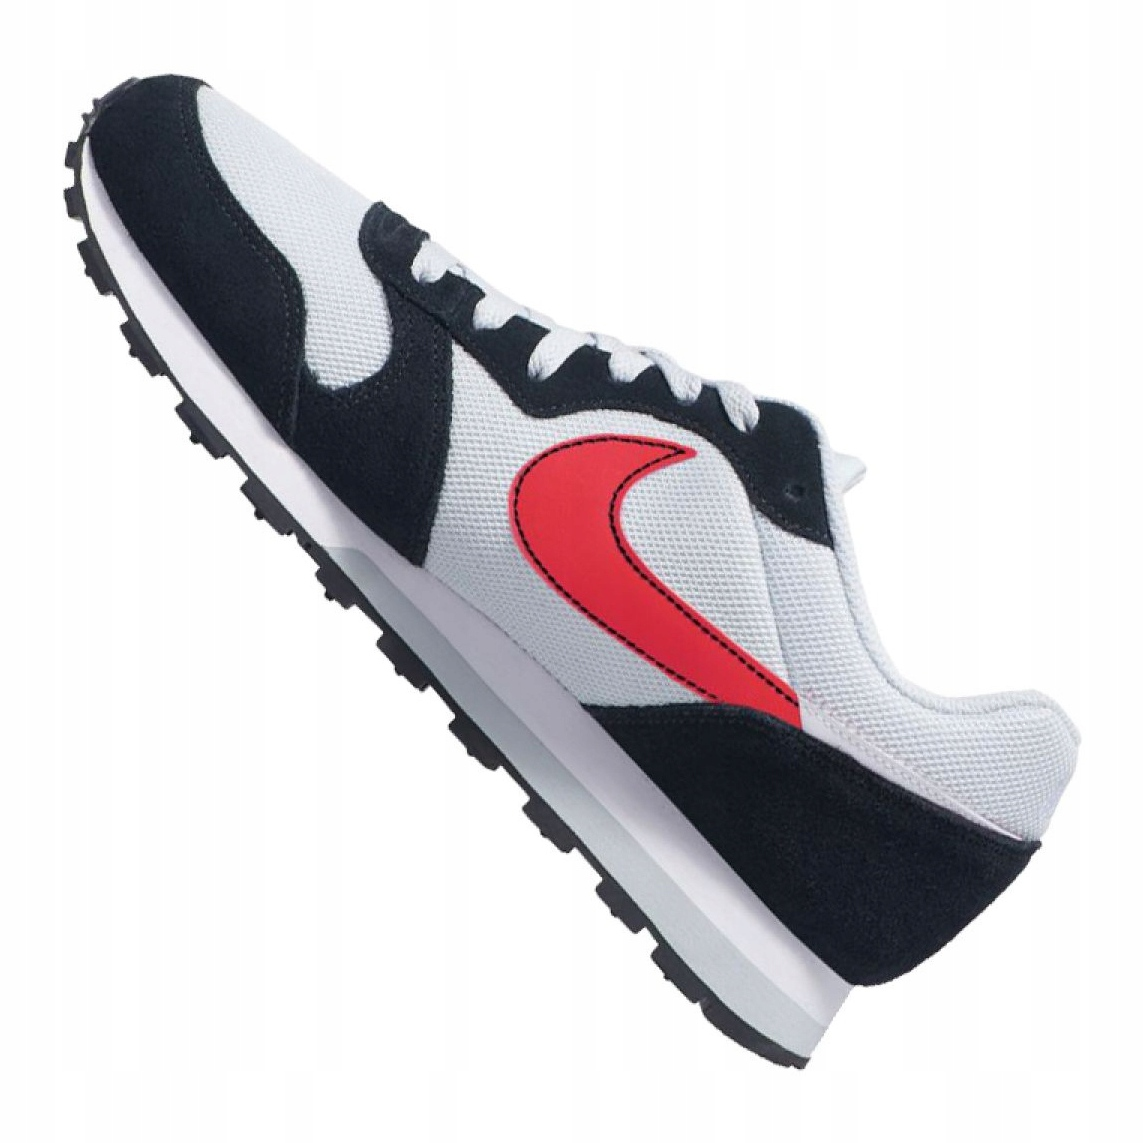 Sapatilhas Nike Md Runner 2 ES1 M CI2232 001